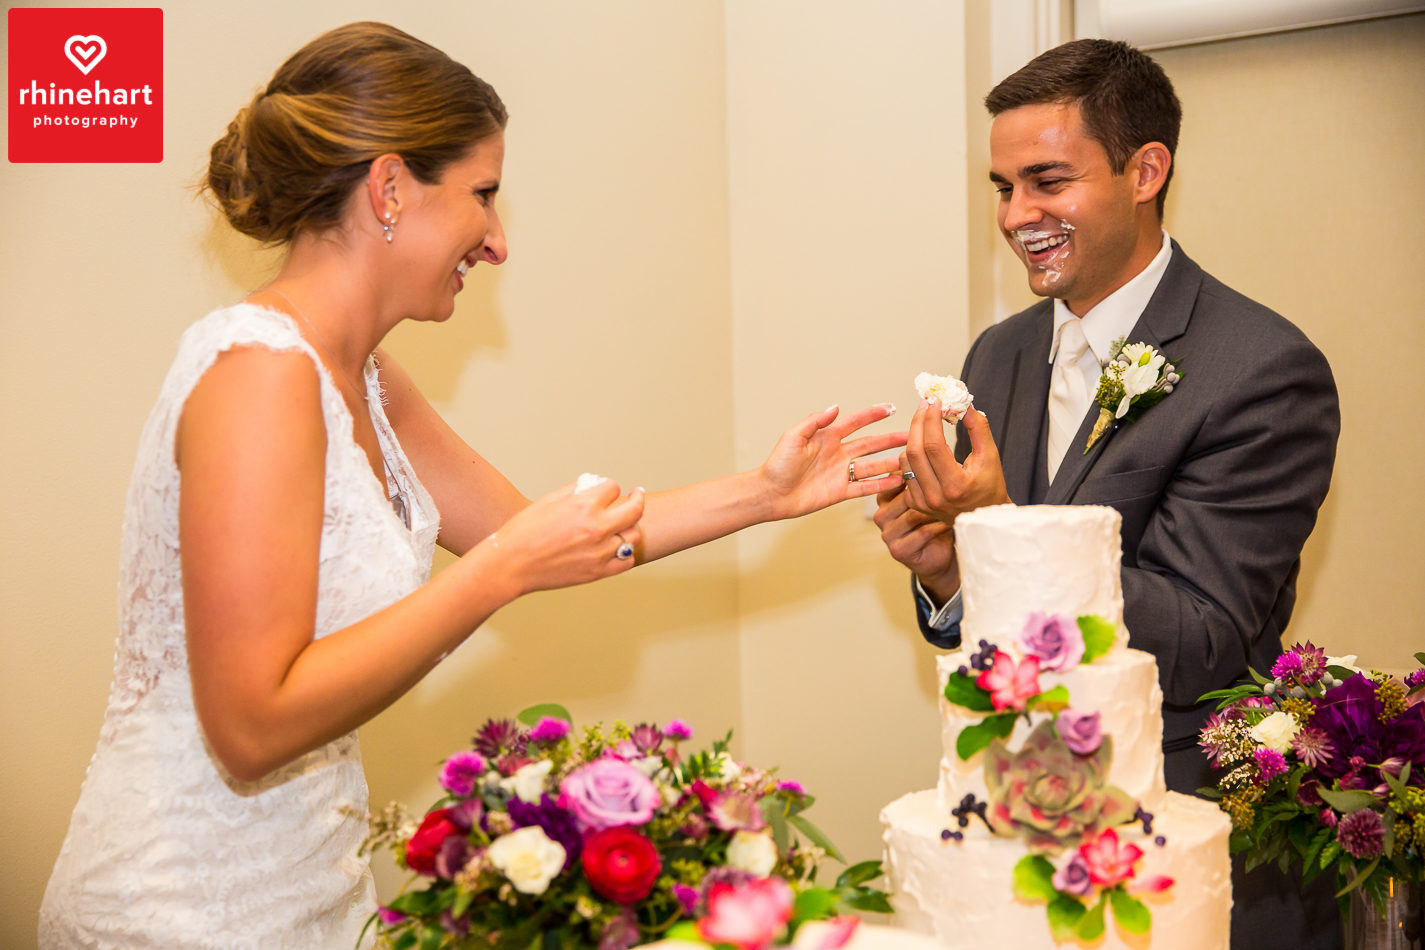 glasbern-inn-wedding-photographer-234